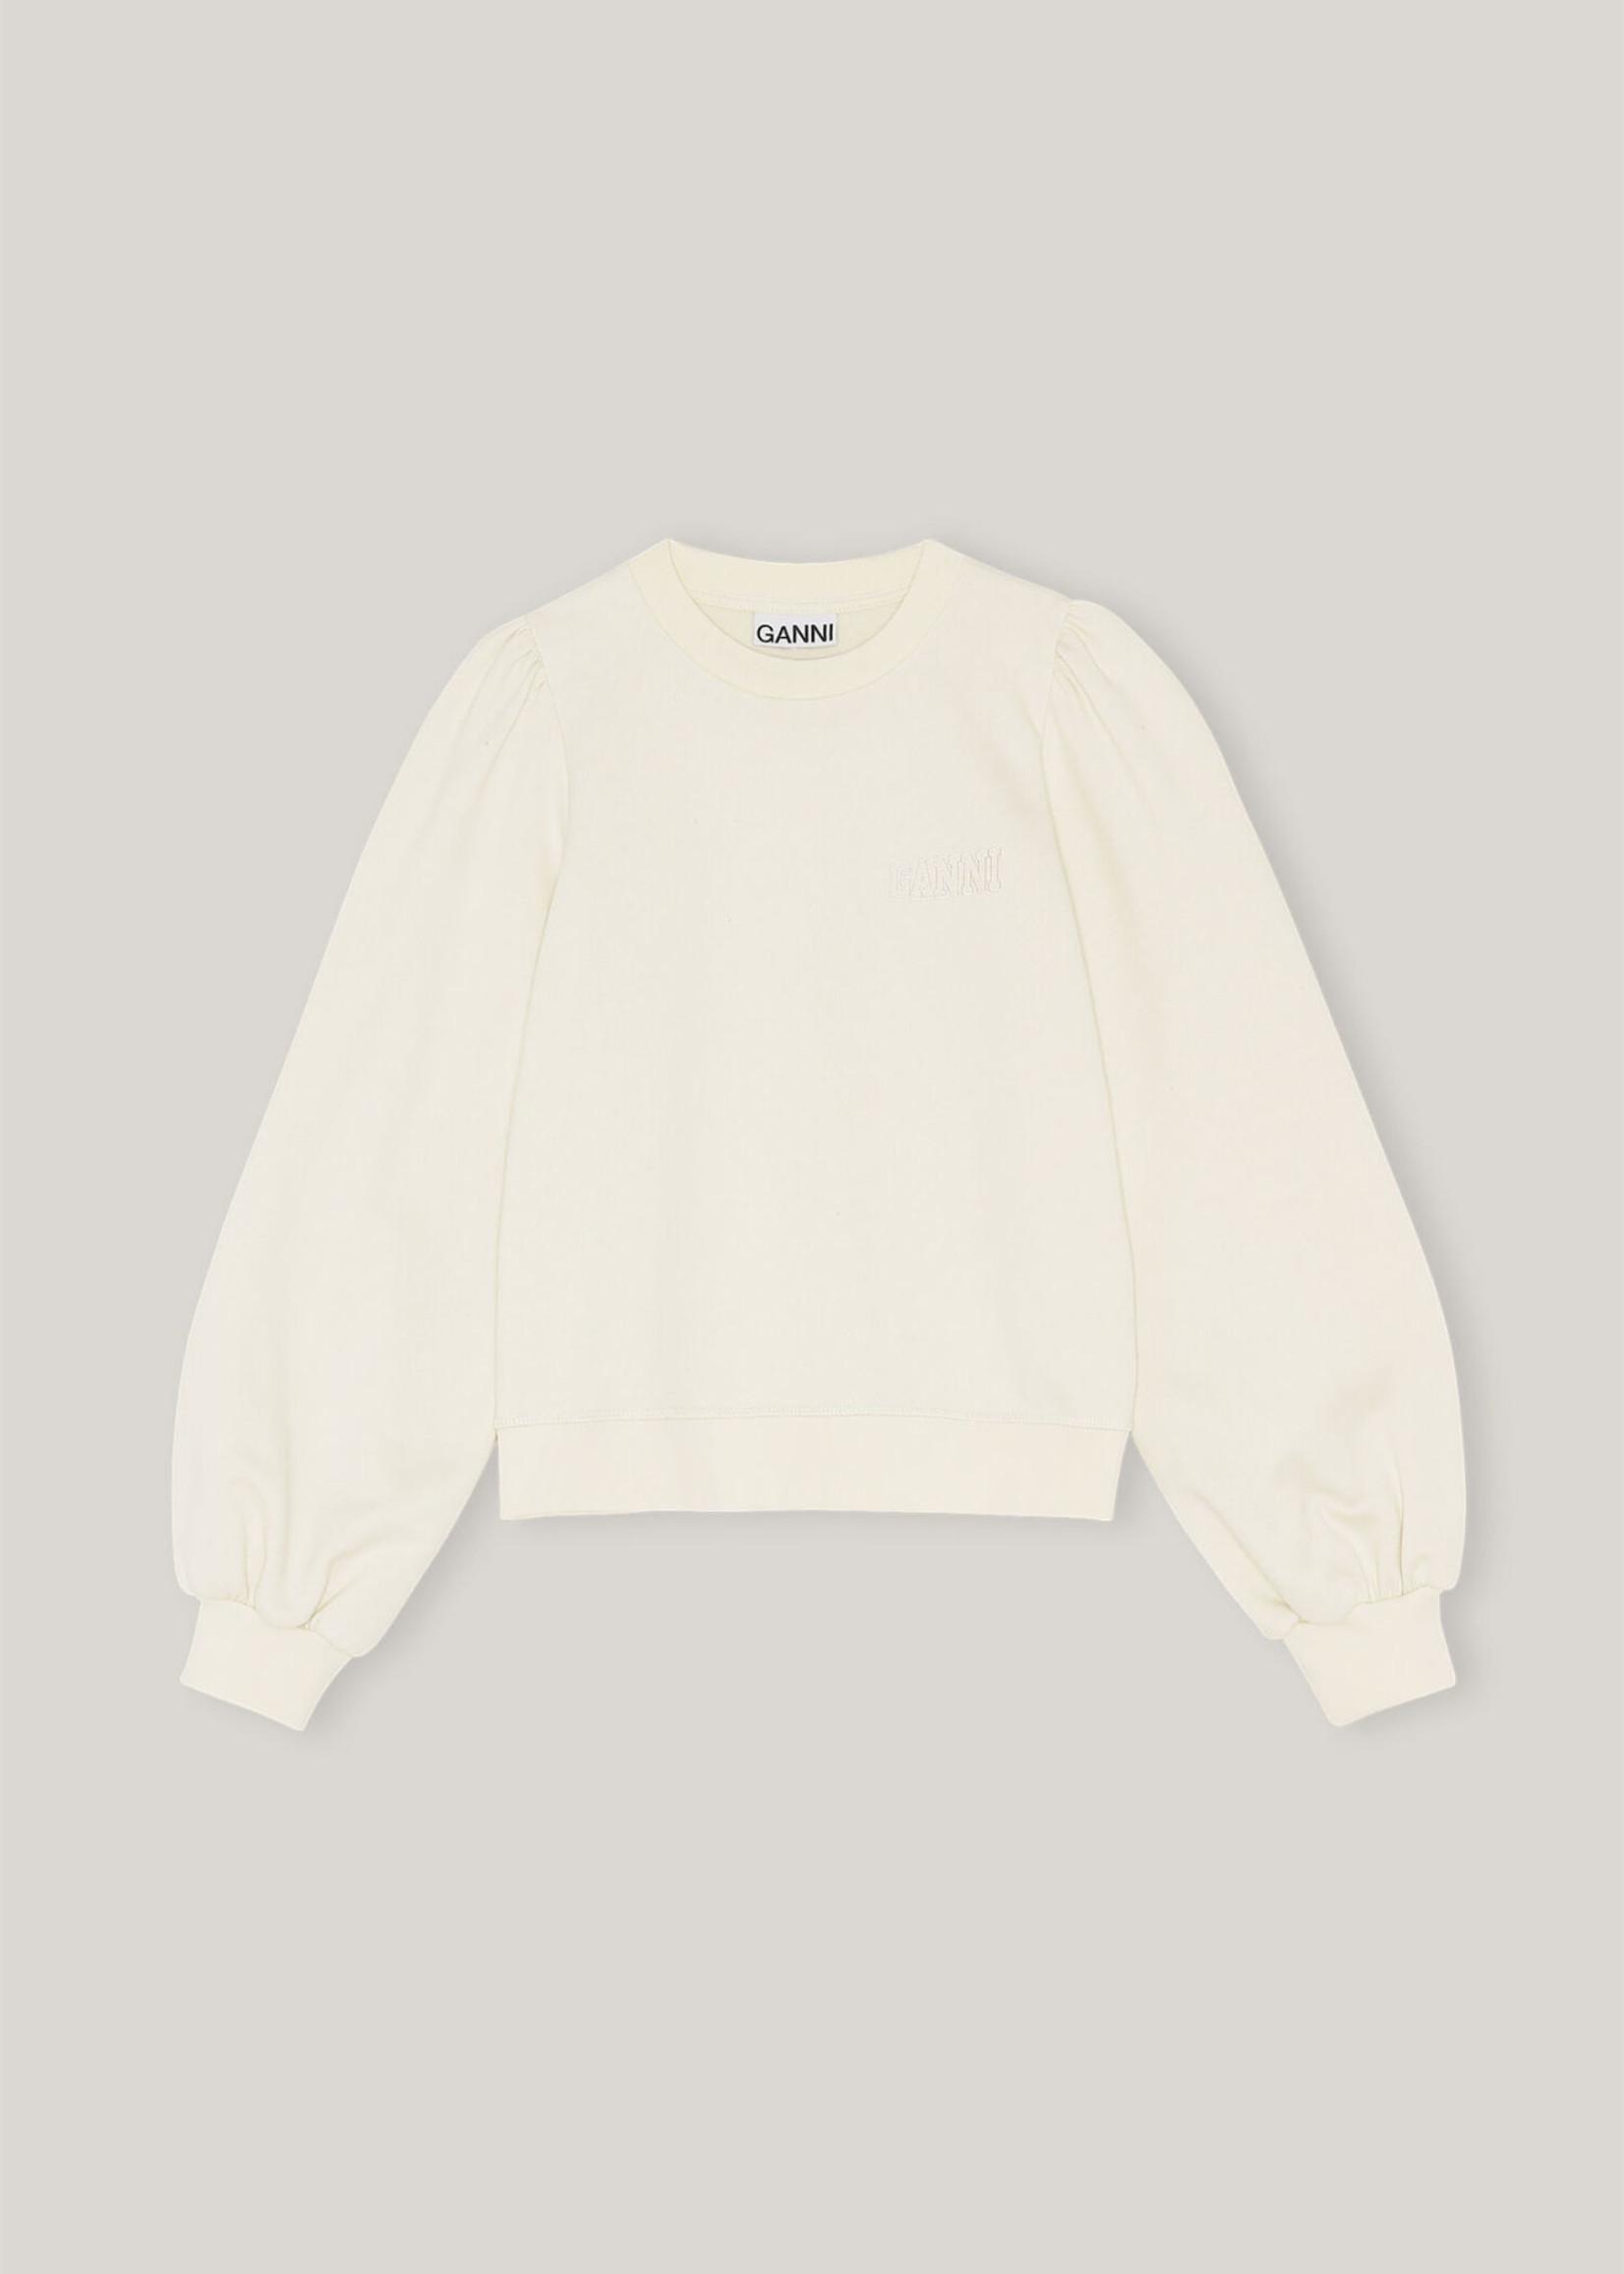 GANNI Puff Sleeve Sweatshirt in Beige